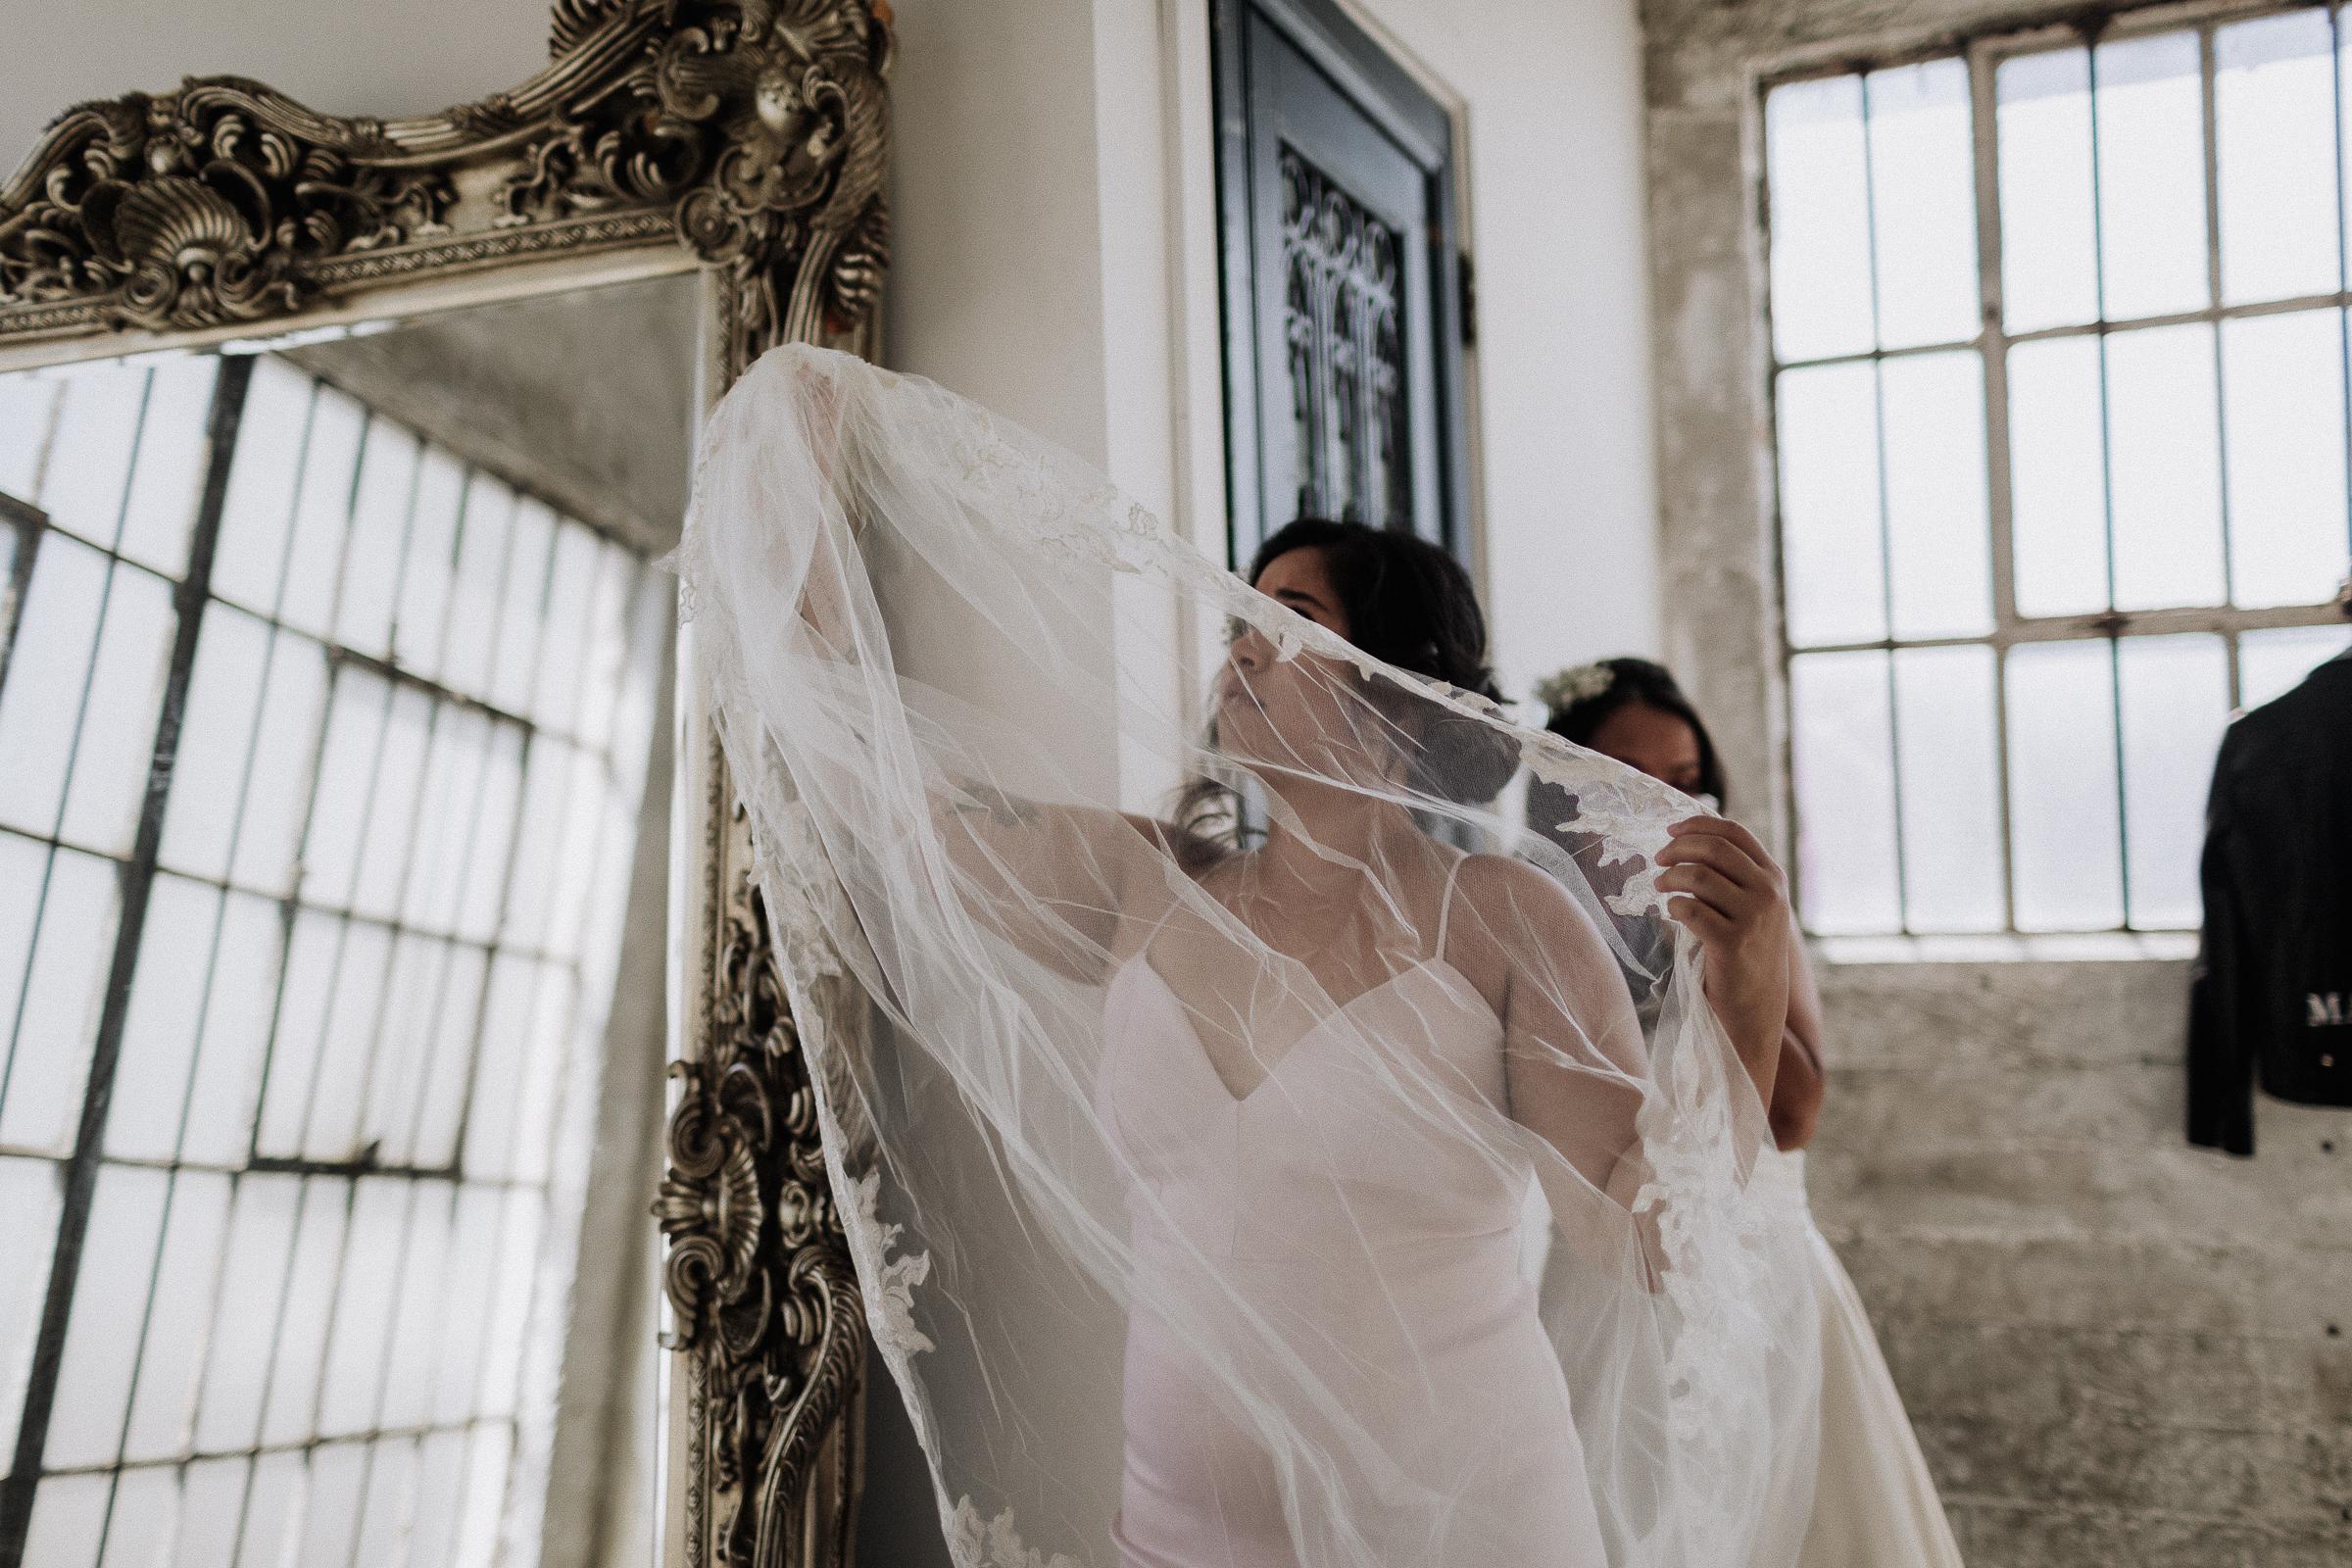 Gretchen Gause Photography | Los Angeles Hudson Loft Wedding #hudsonloft #laweddingphotographer #DTLA #weddingplanning #romanticwedding #rooftopwedding #weddingphotography #weddingdress #veils